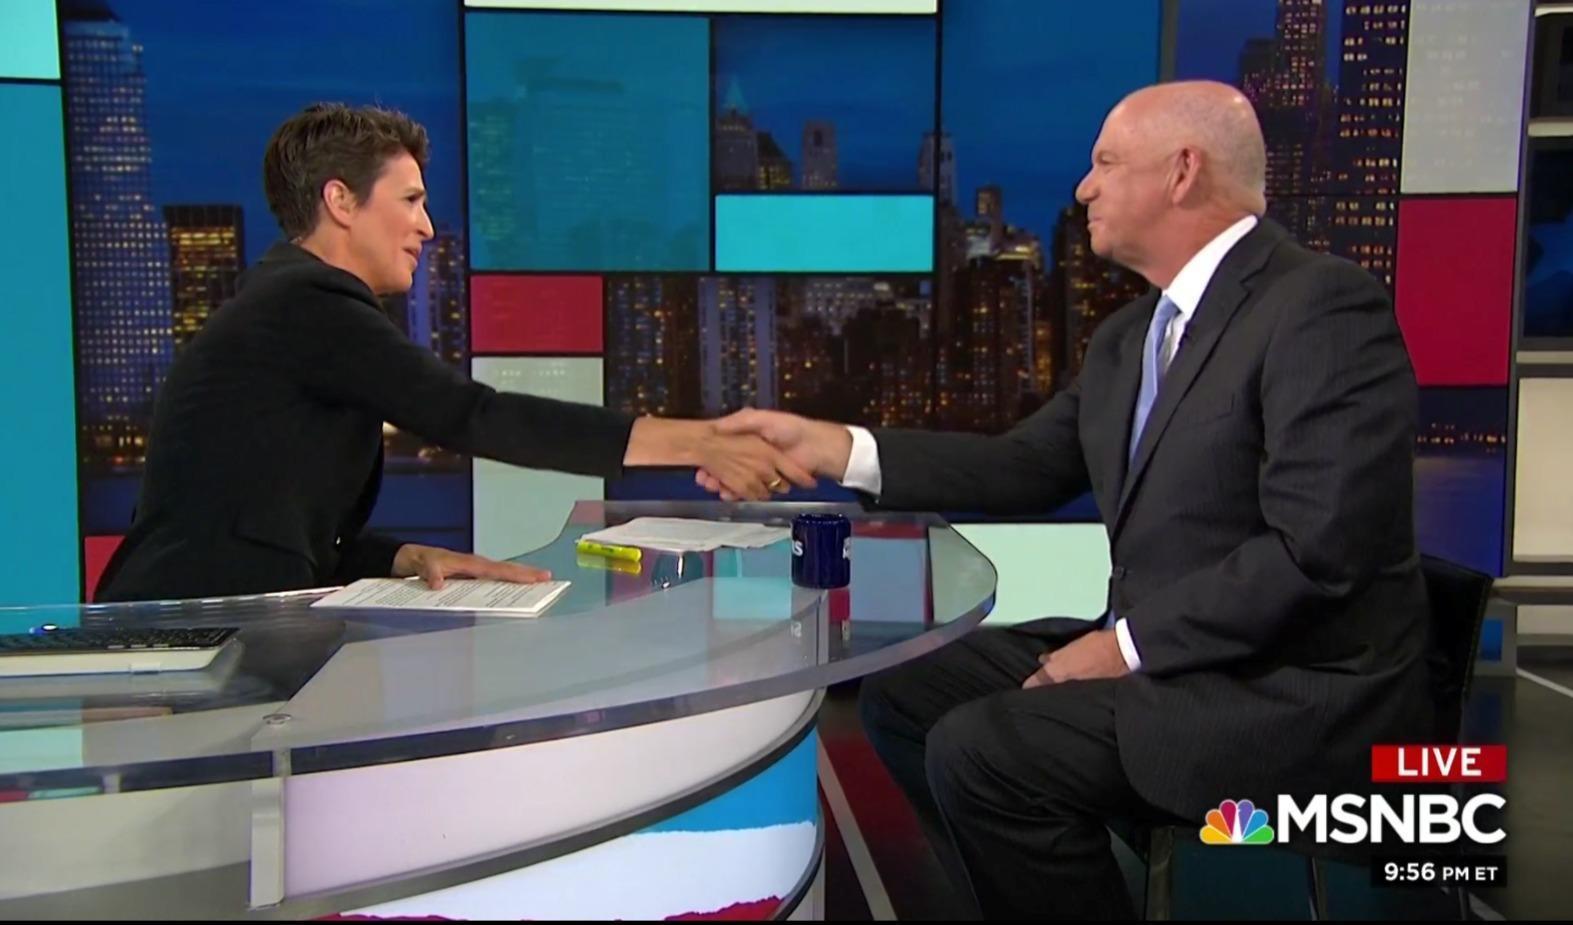 Rachel Maddow shaking hands with David Hickton